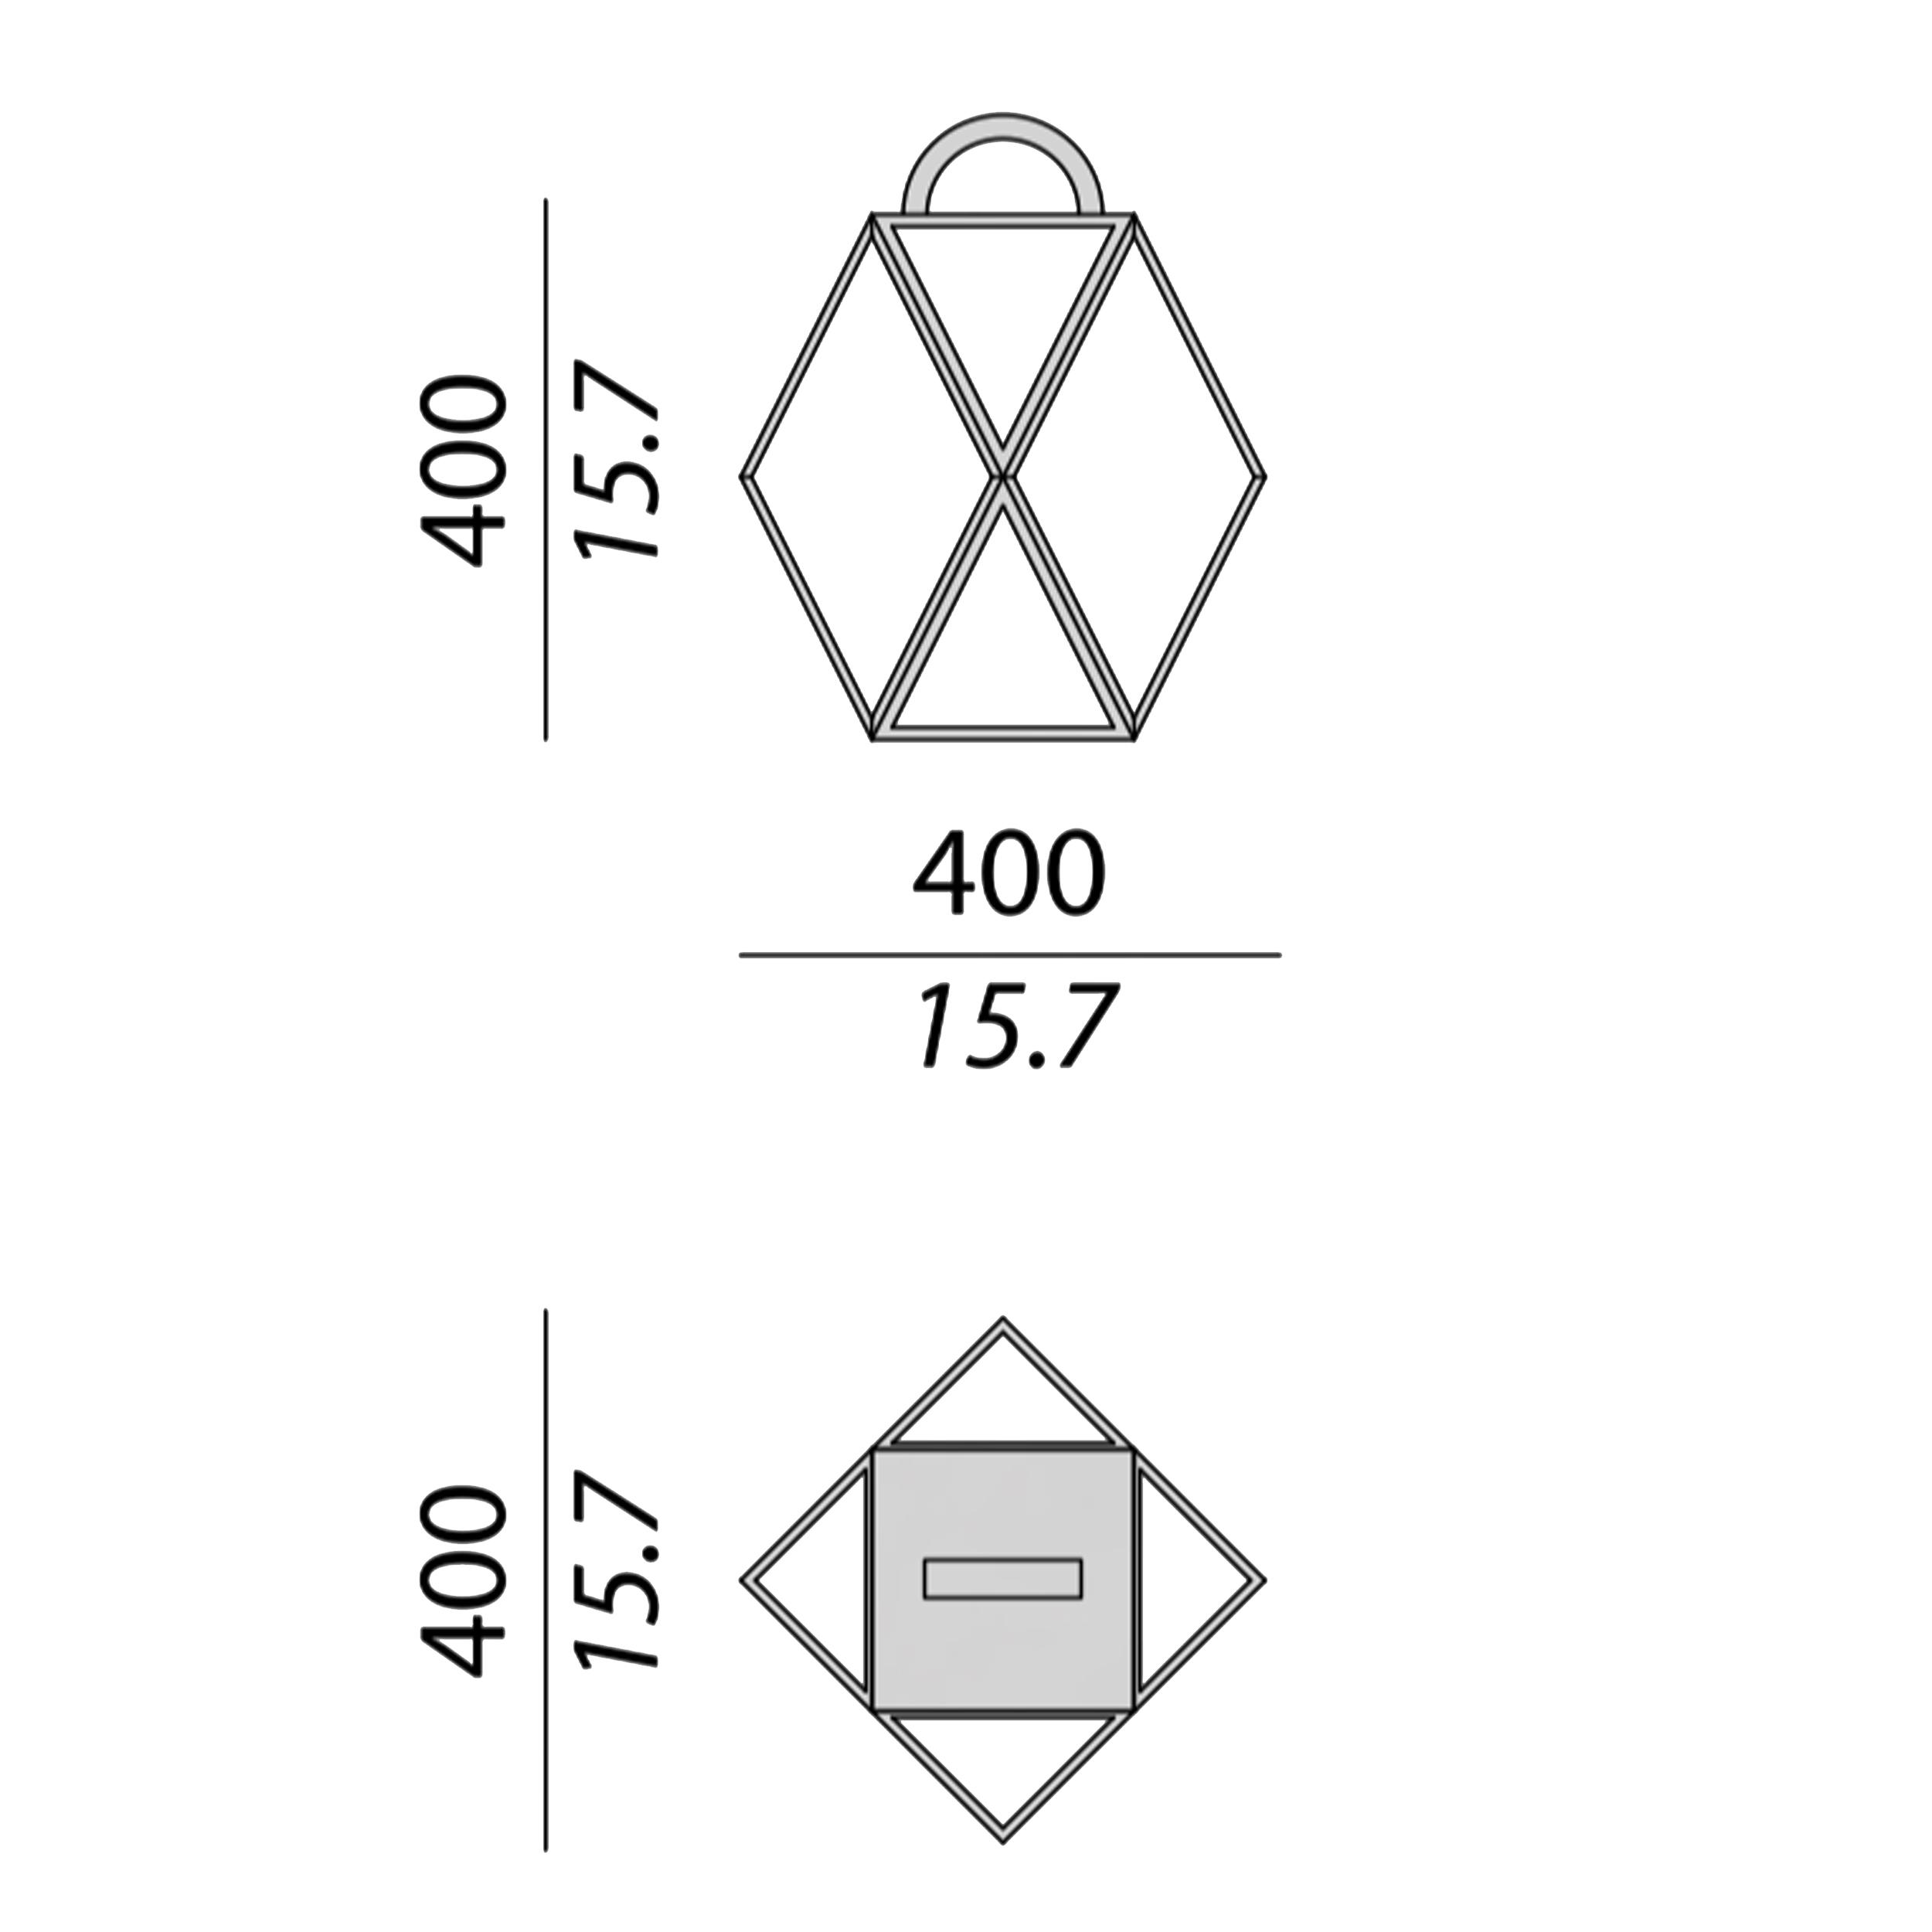 Contardi Muse Lantern Outdoor Table Lamp Line Drawing